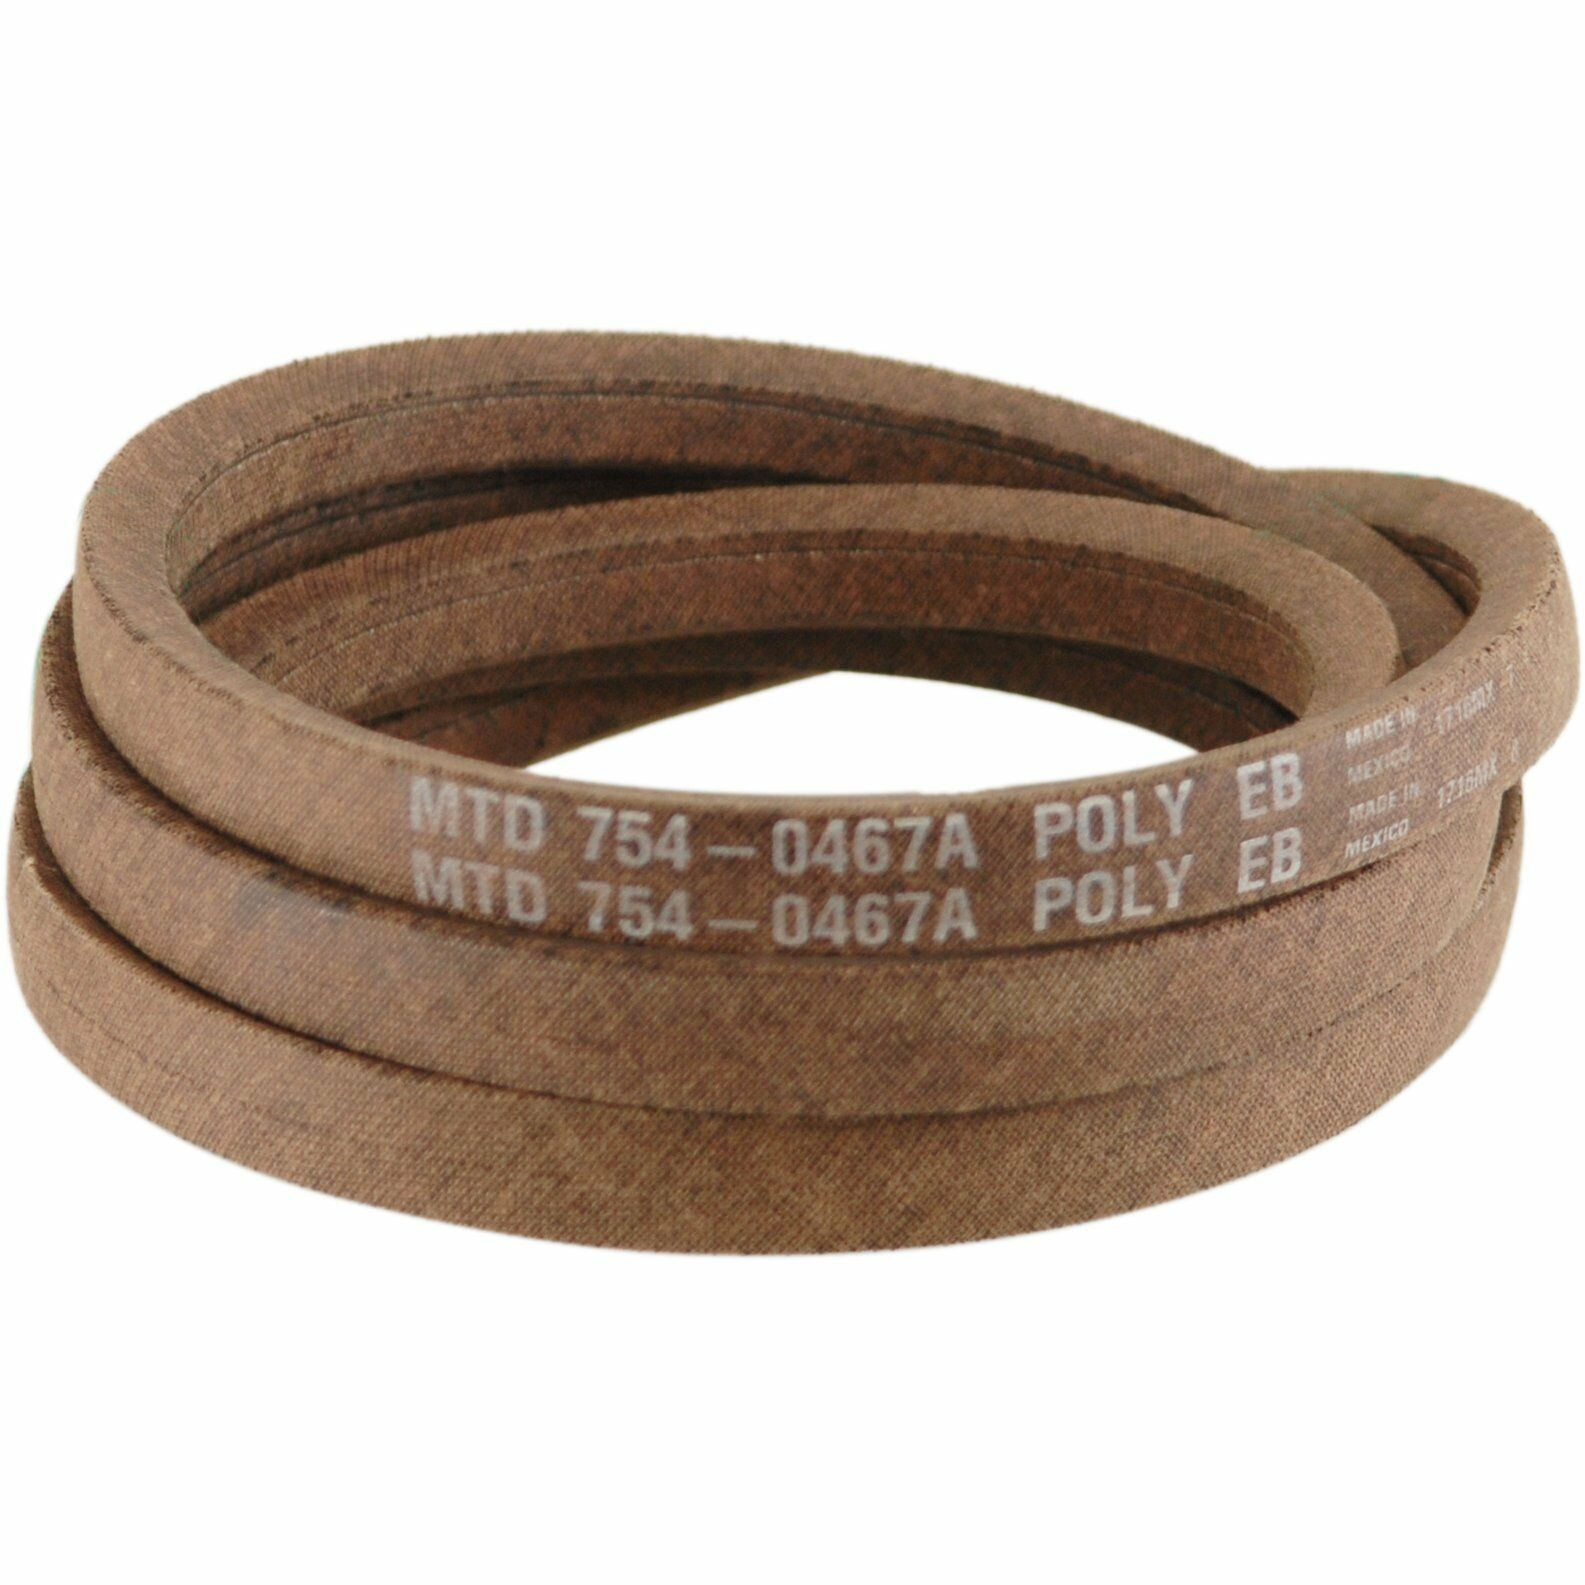 D/&D PowerDrive 112-0301 Toro or Wheel Horse Kevlar Replacement Belt 1 Band 90 Length 90 Length Aramid